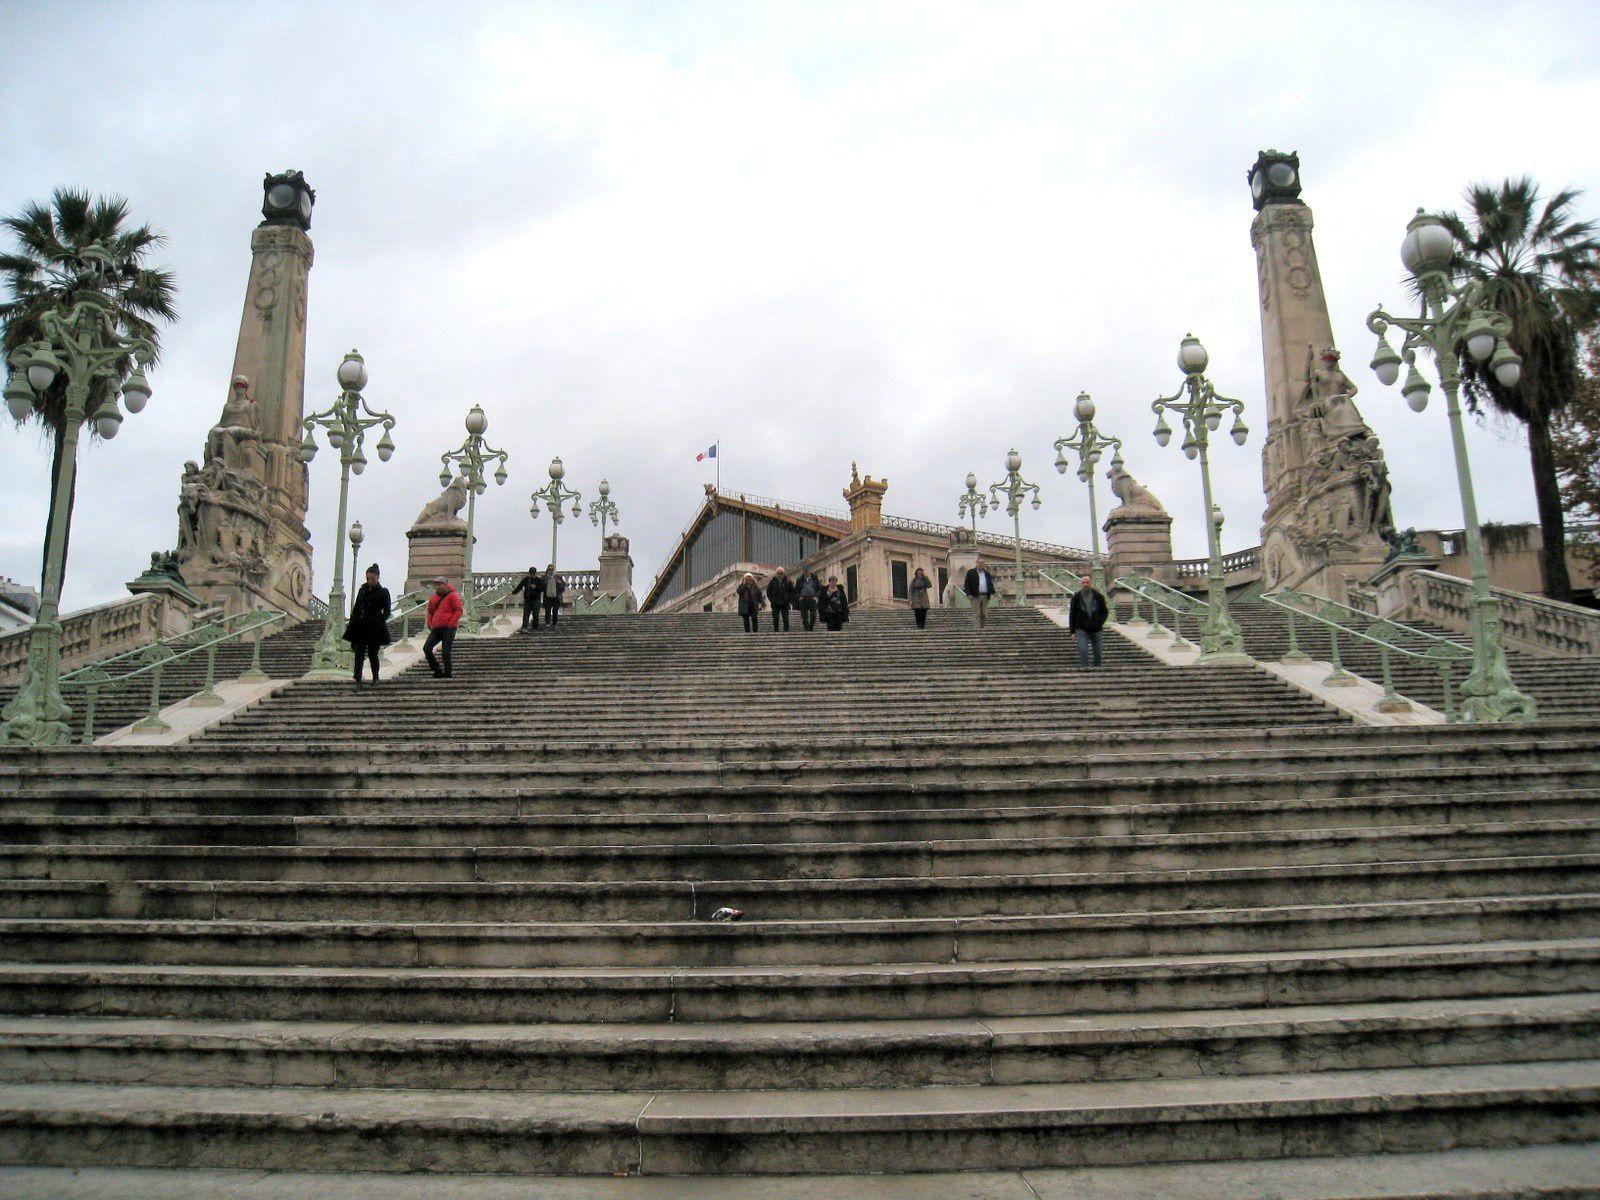 L'escalier monumental de la gare St Charles, Marseille